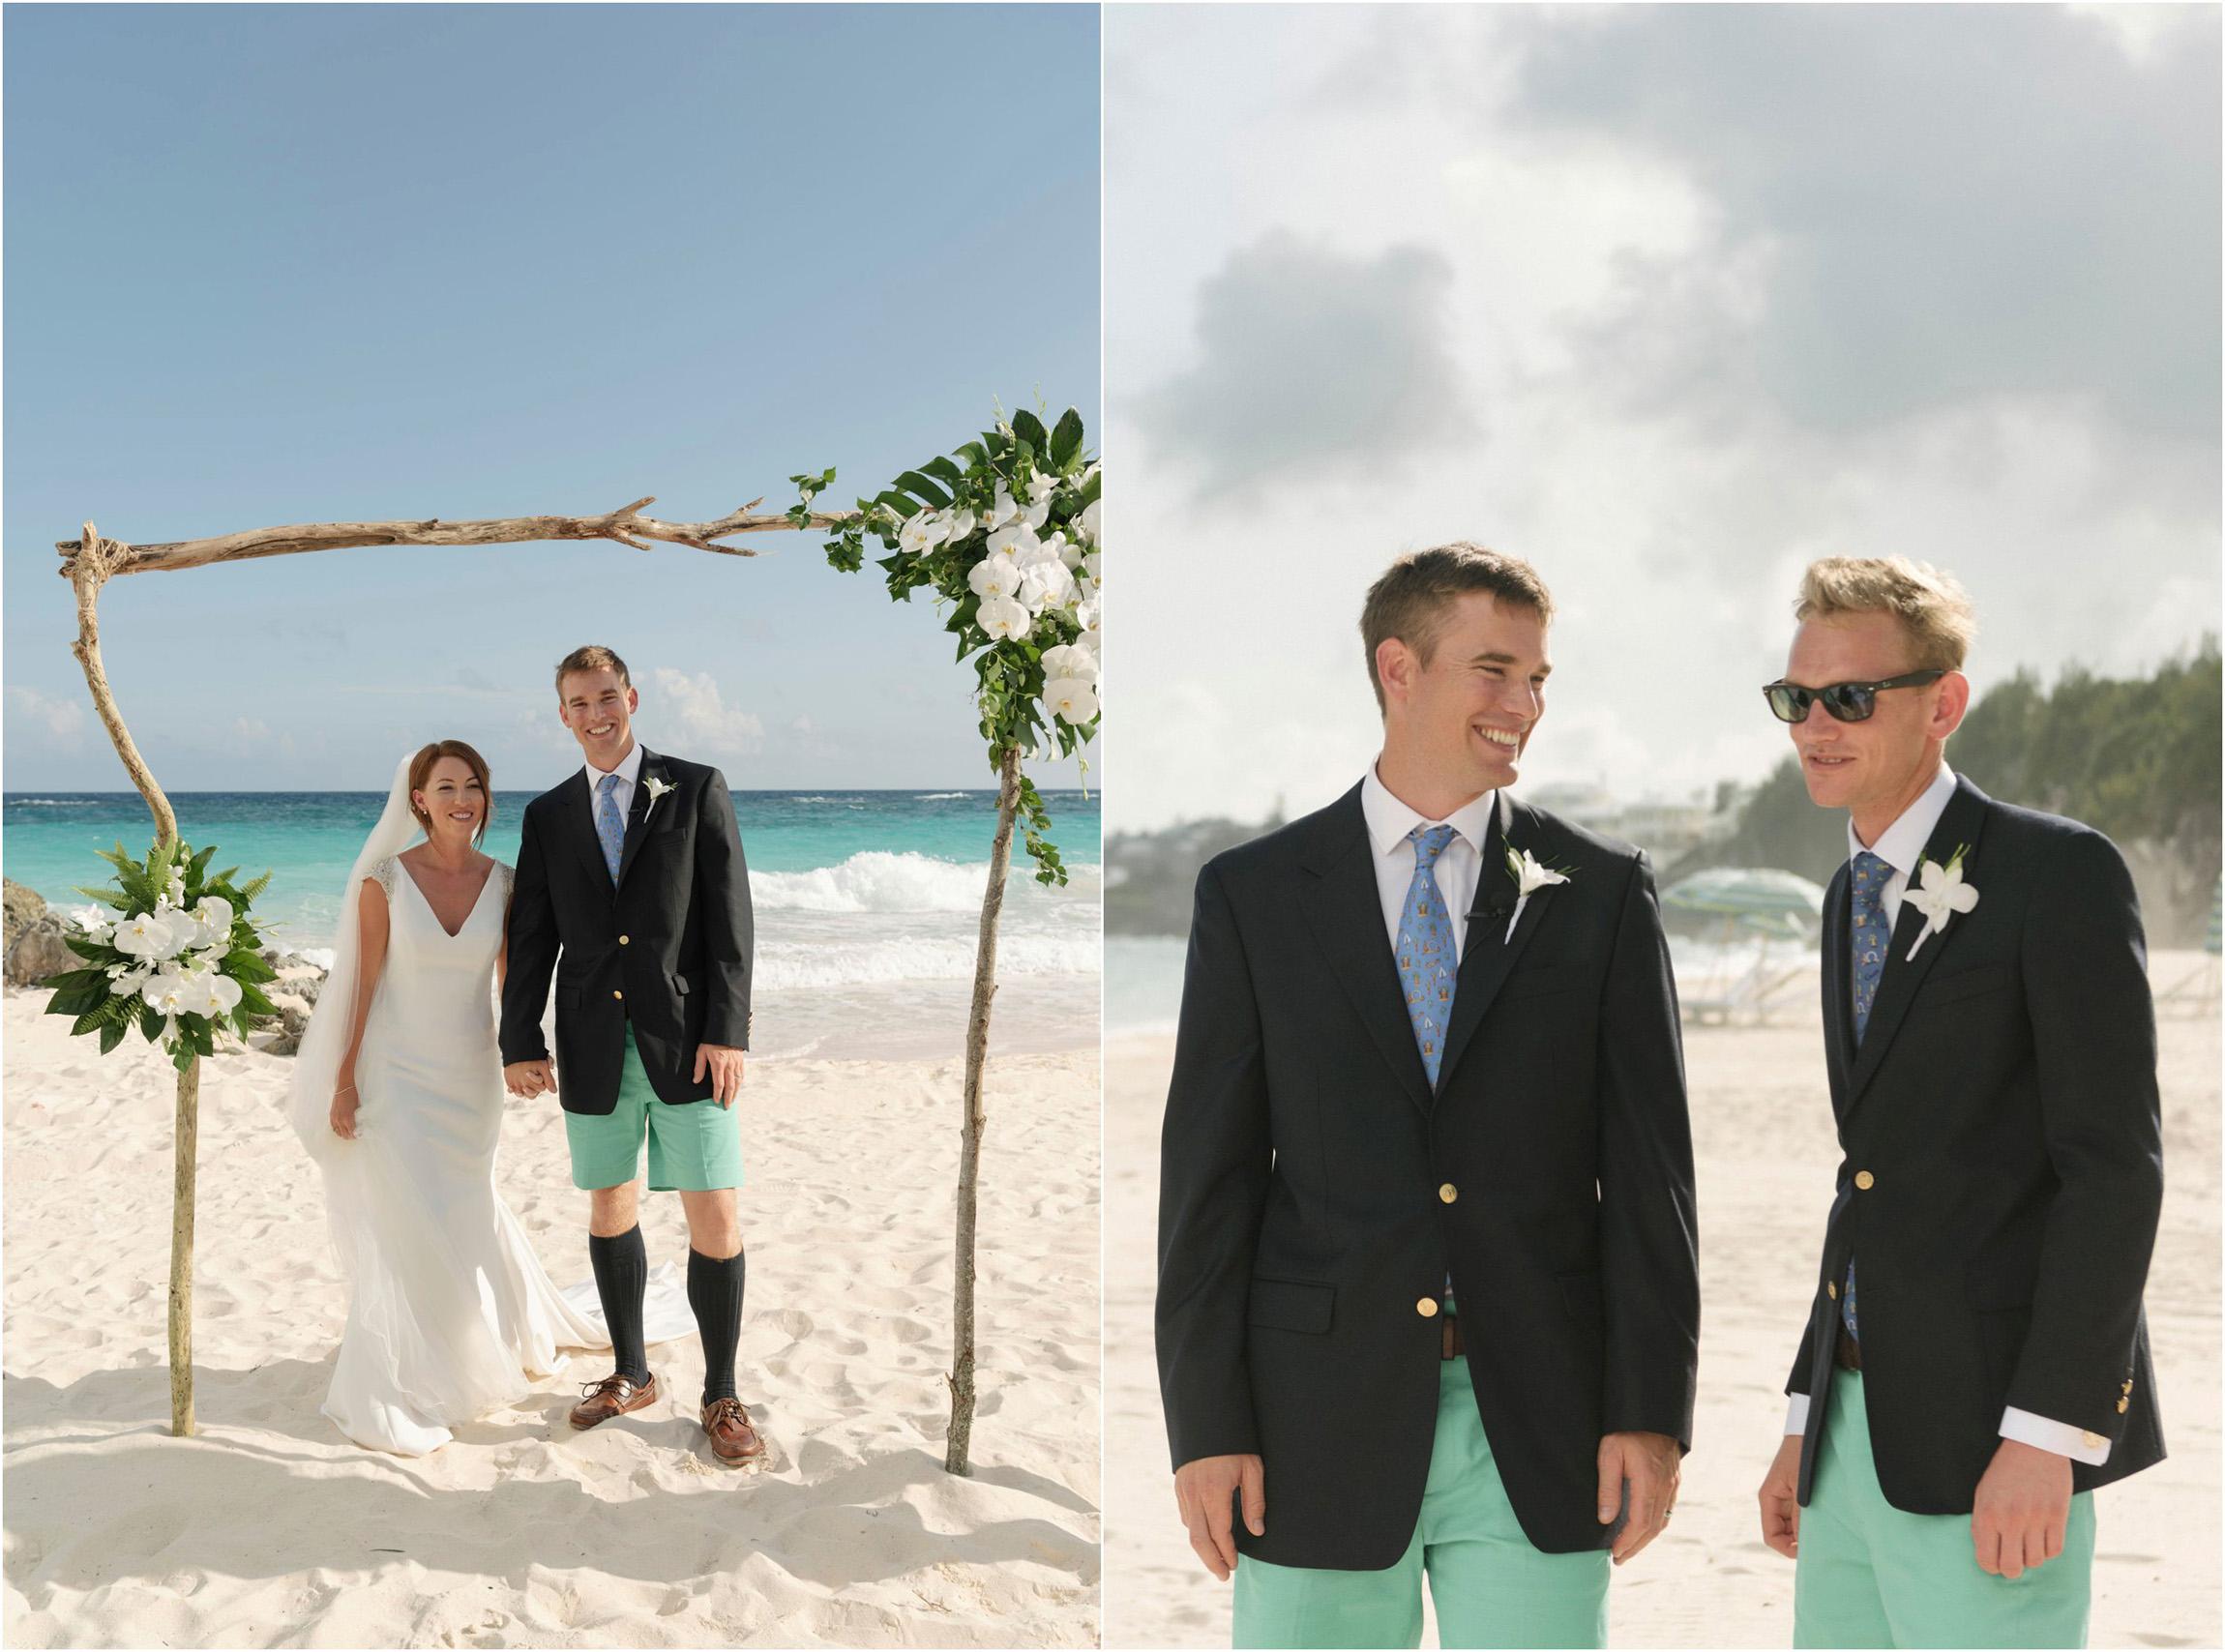 ©FianderFoto_Bermuda Wedding Photographer_Mid Ocean_Rachel_Angus_053.jpg